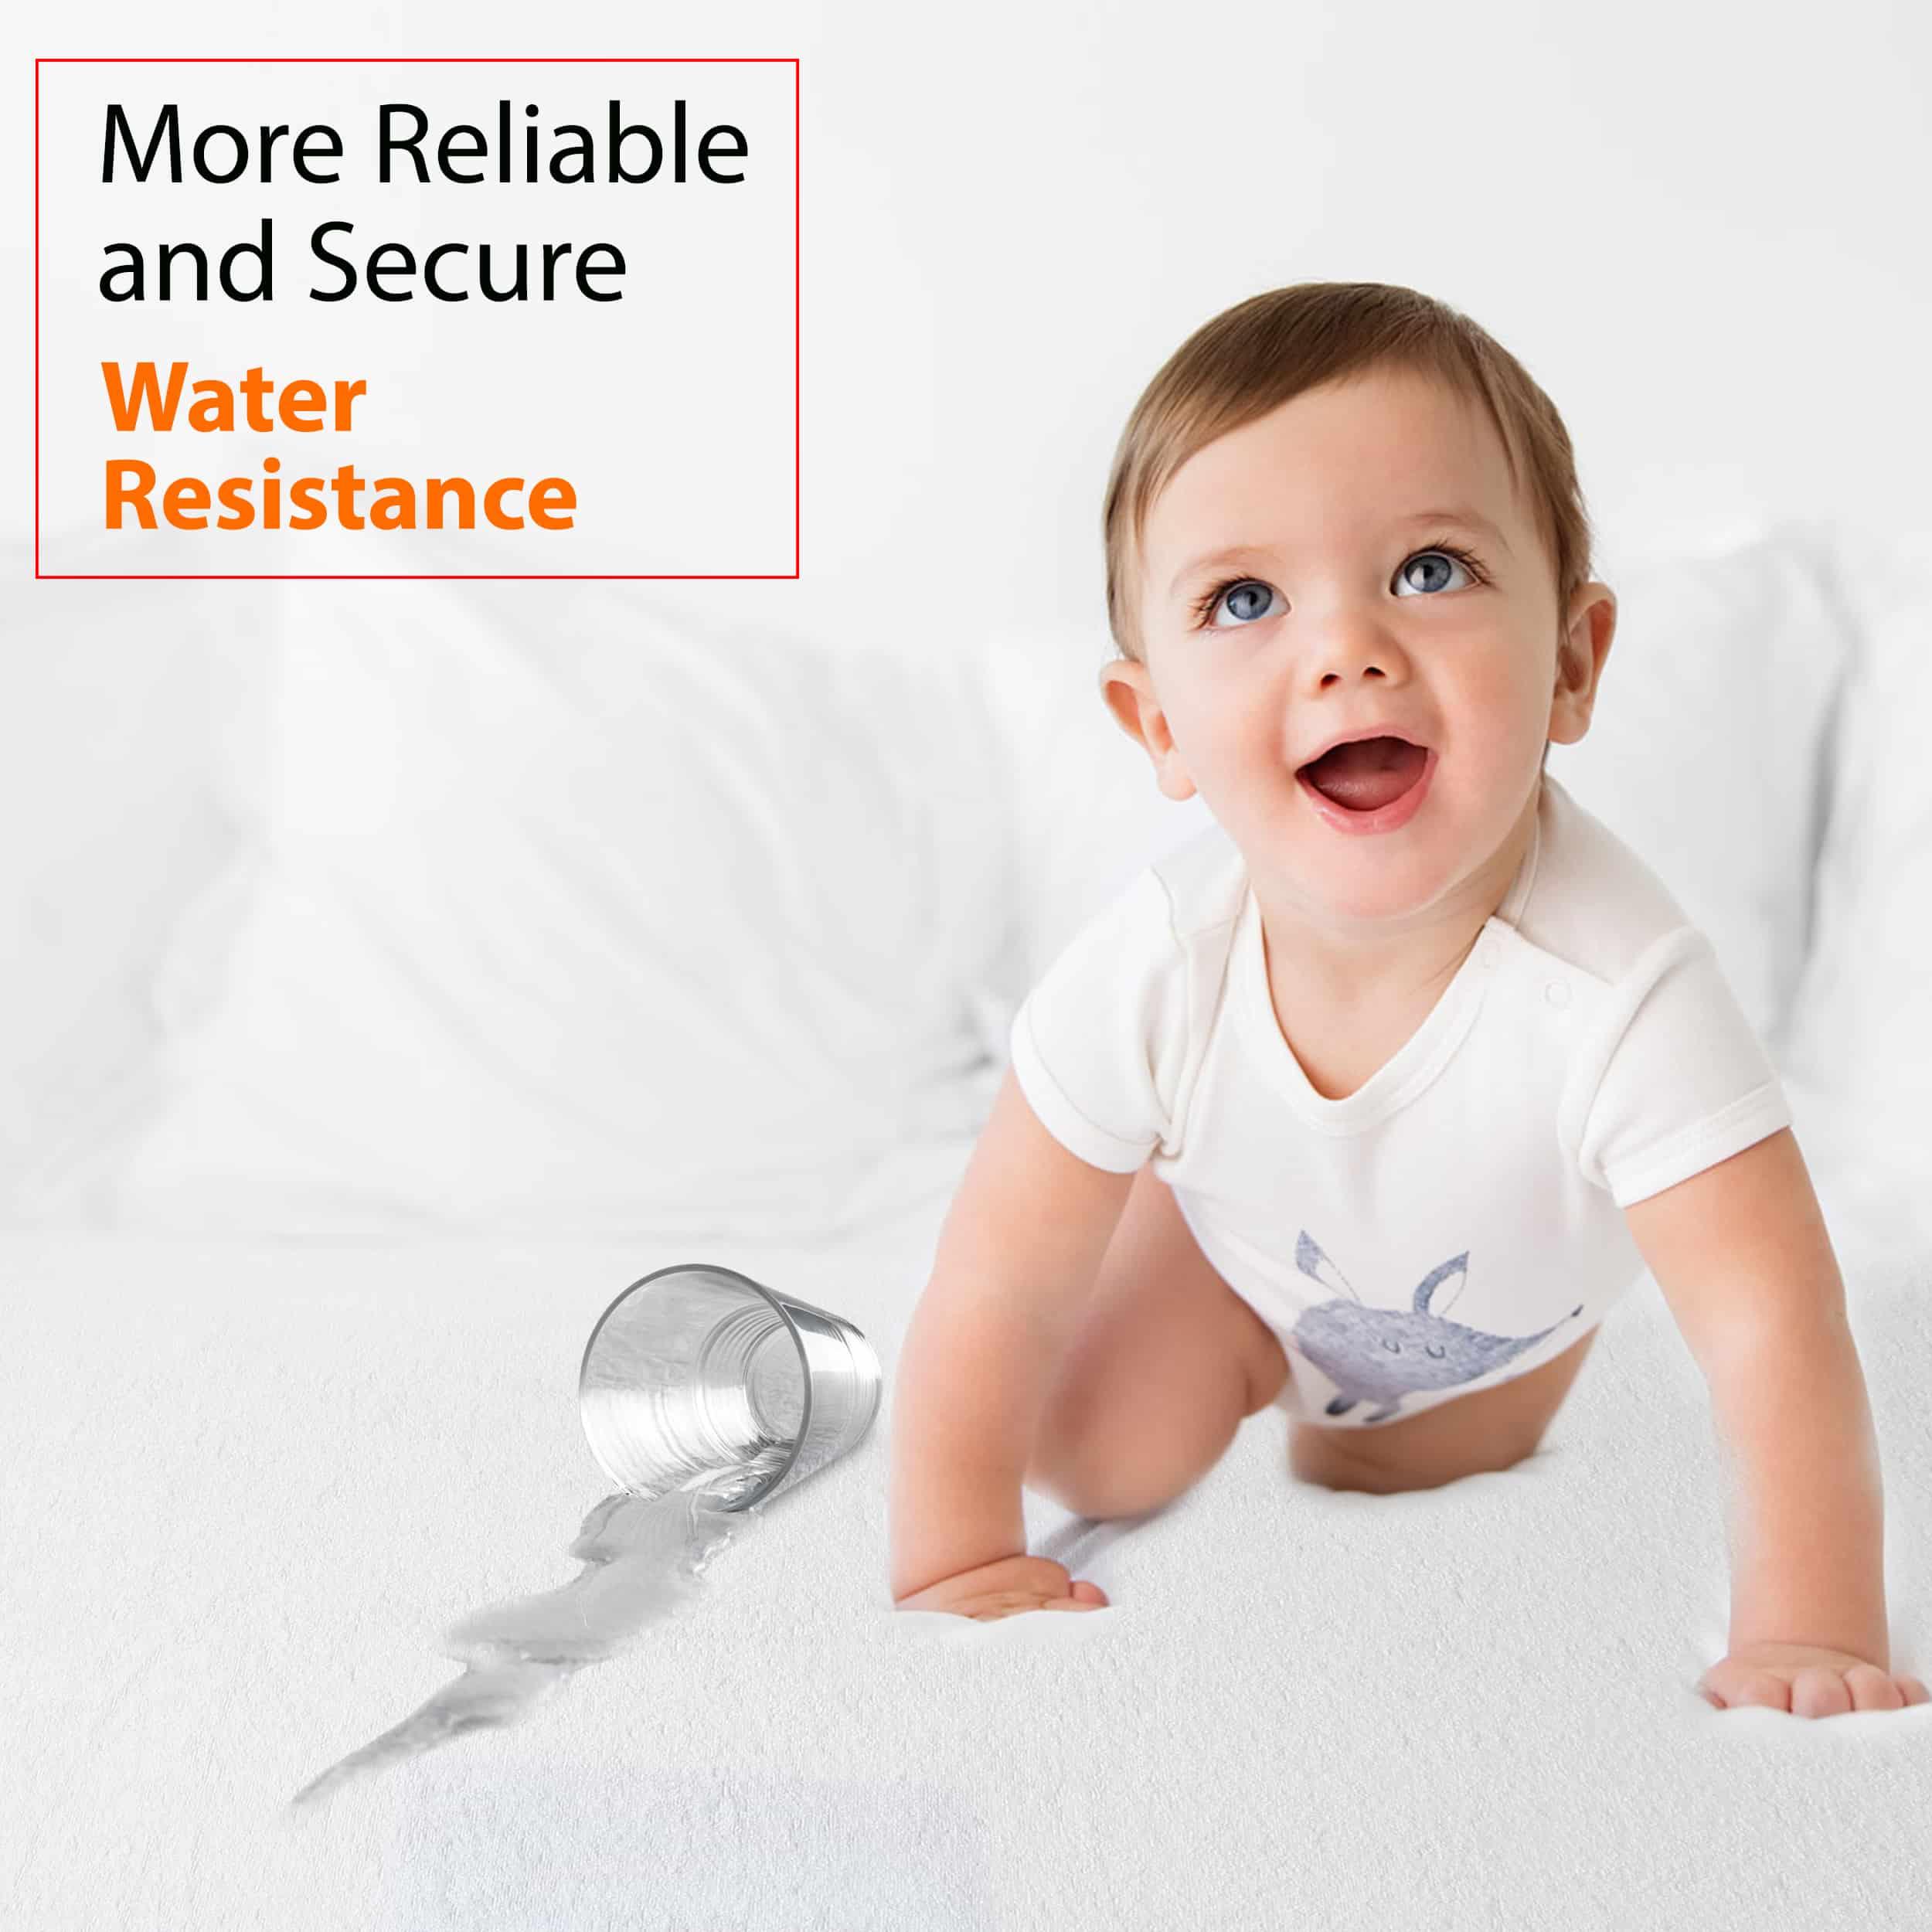 Water-Resistance-Mattress-Protector-min.jpg?time=1635056428